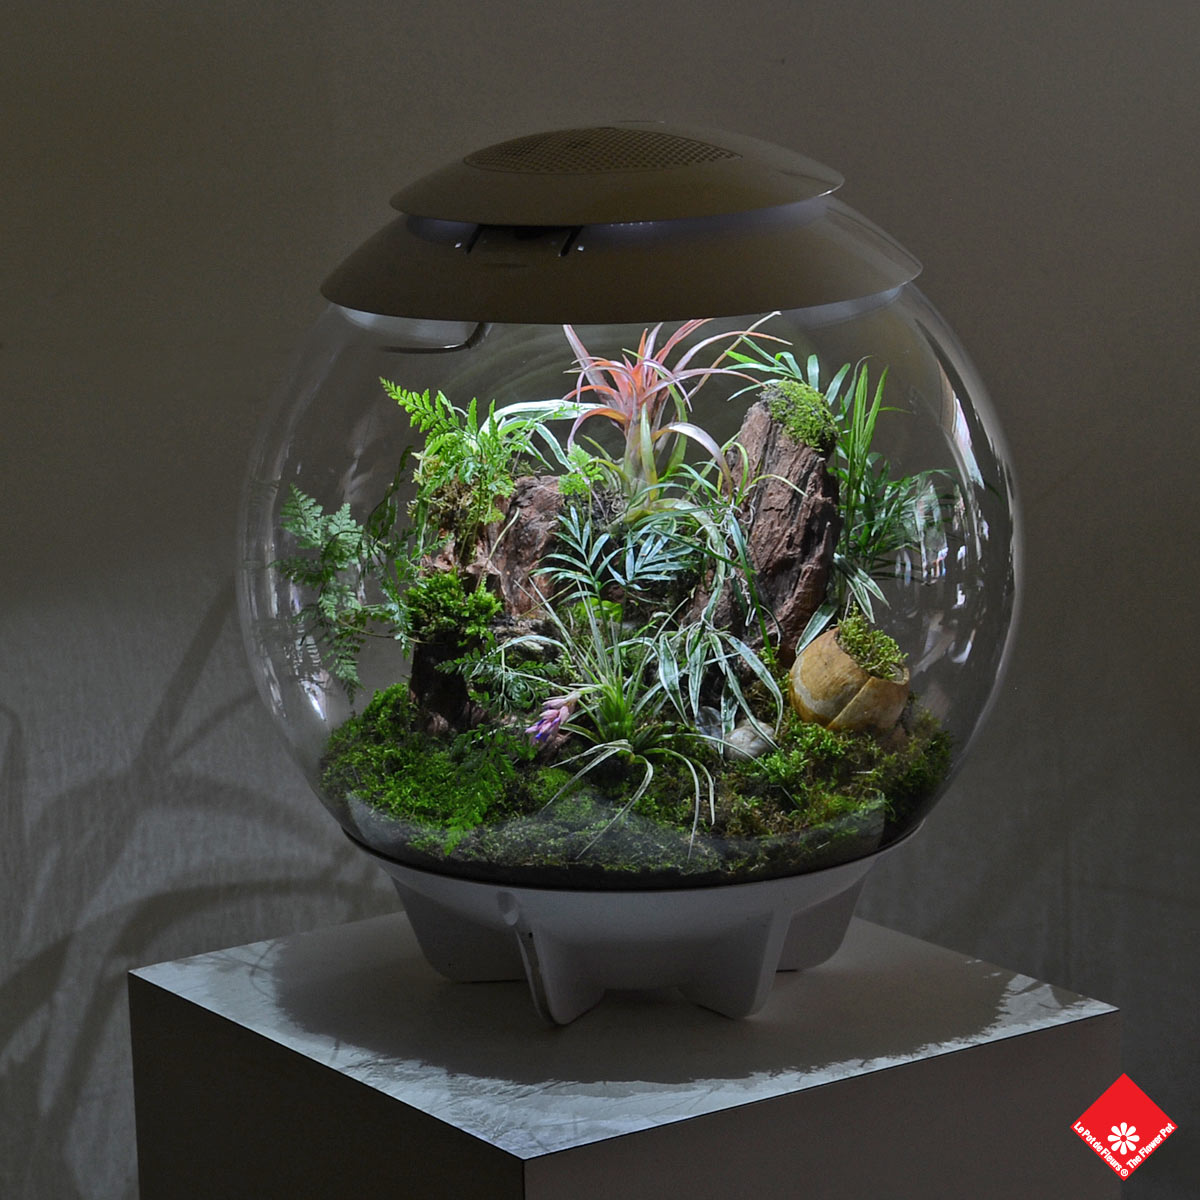 0 salon vert plantes - Cloche de jardin en verre ...